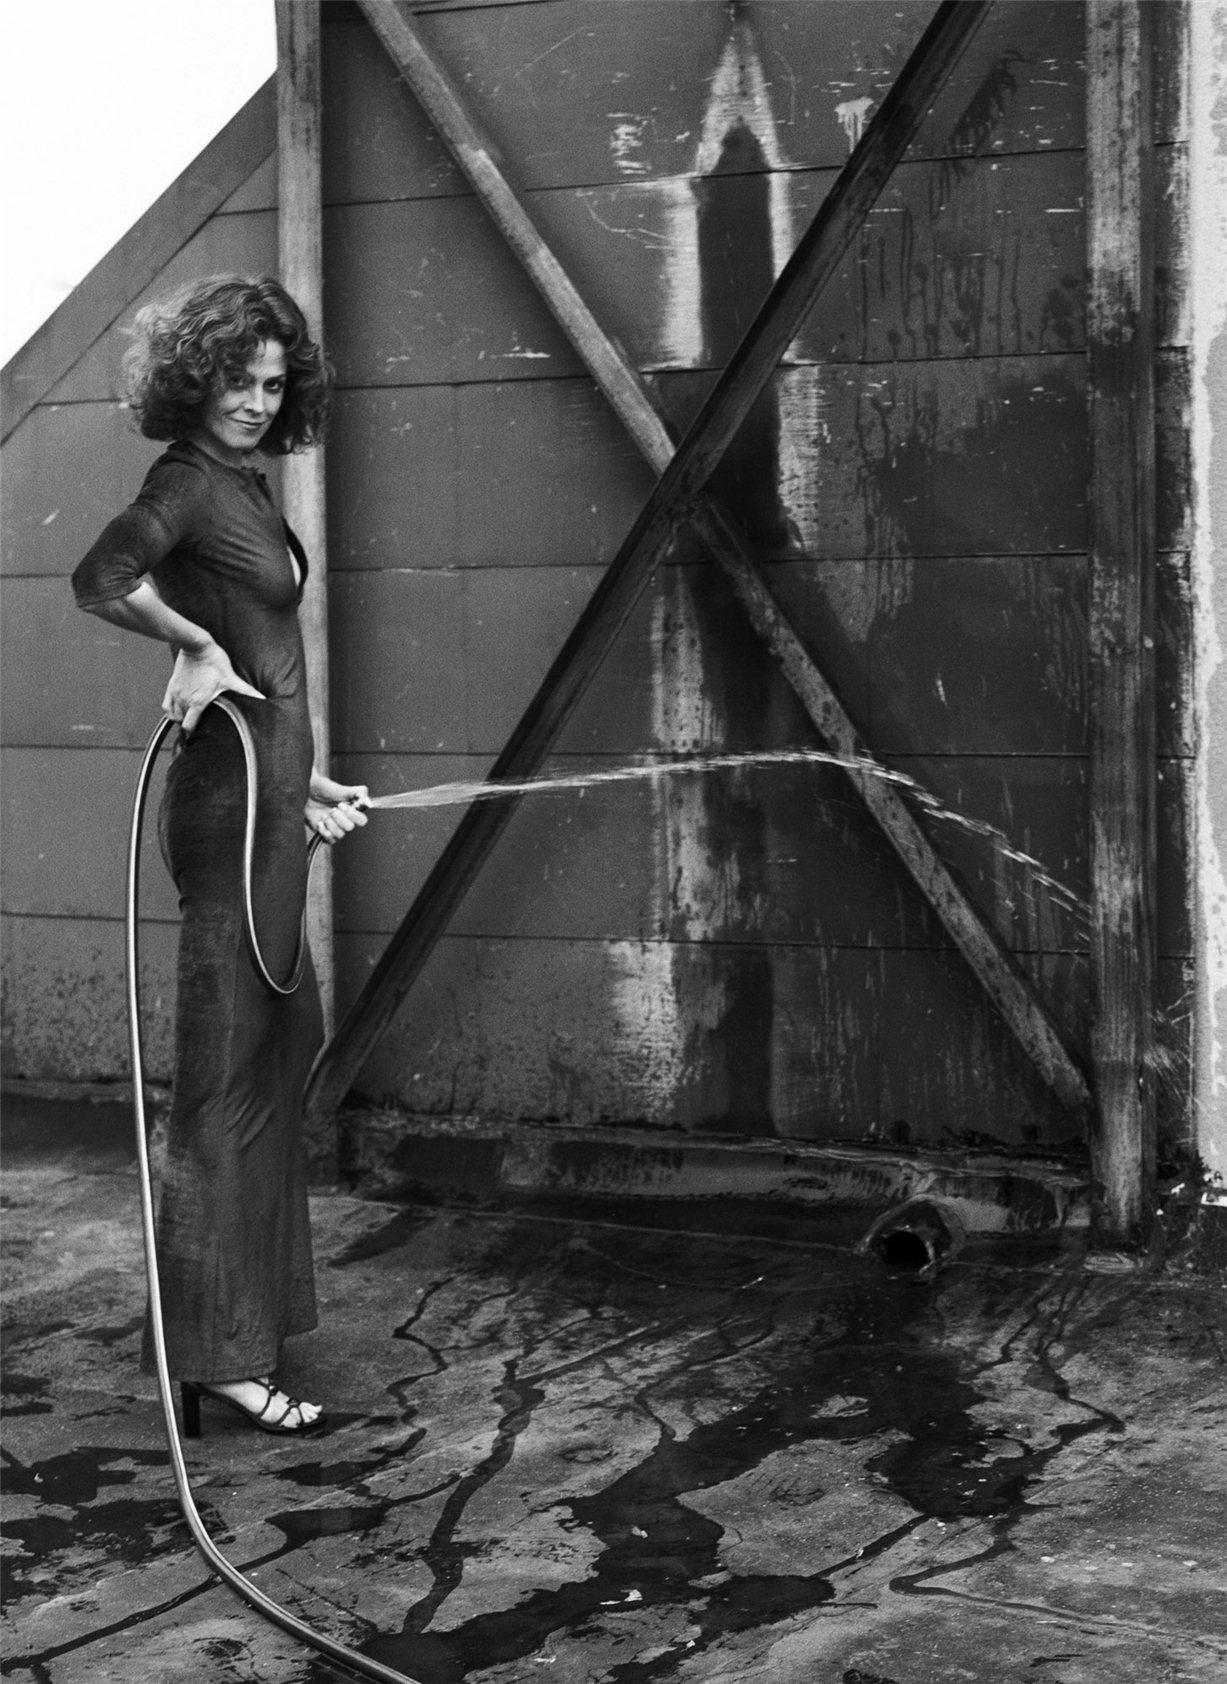 Sigourney Weaver / Сигурни Уивер - звезды Голливуда, фотограф Firooz Zahedi